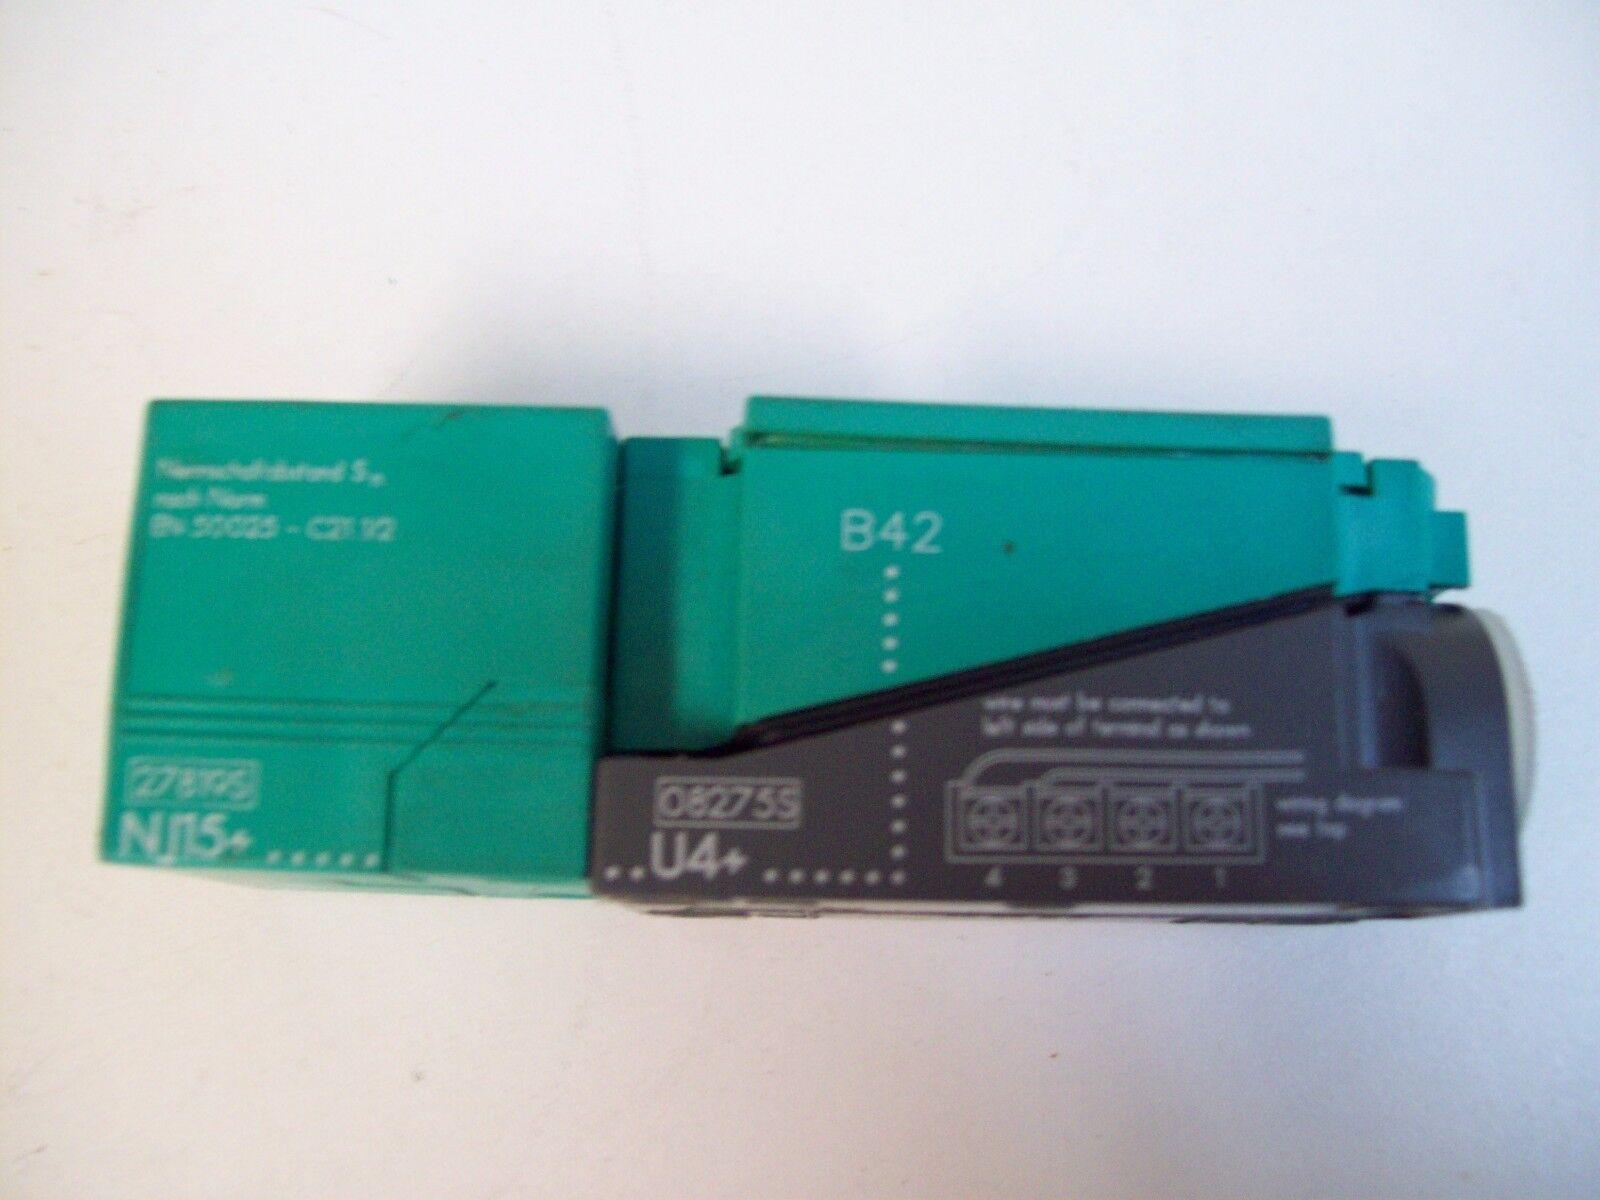 Pepperl & Fuchs NJ15 5 Way Inductive Proximity Sensor Switch | eBay